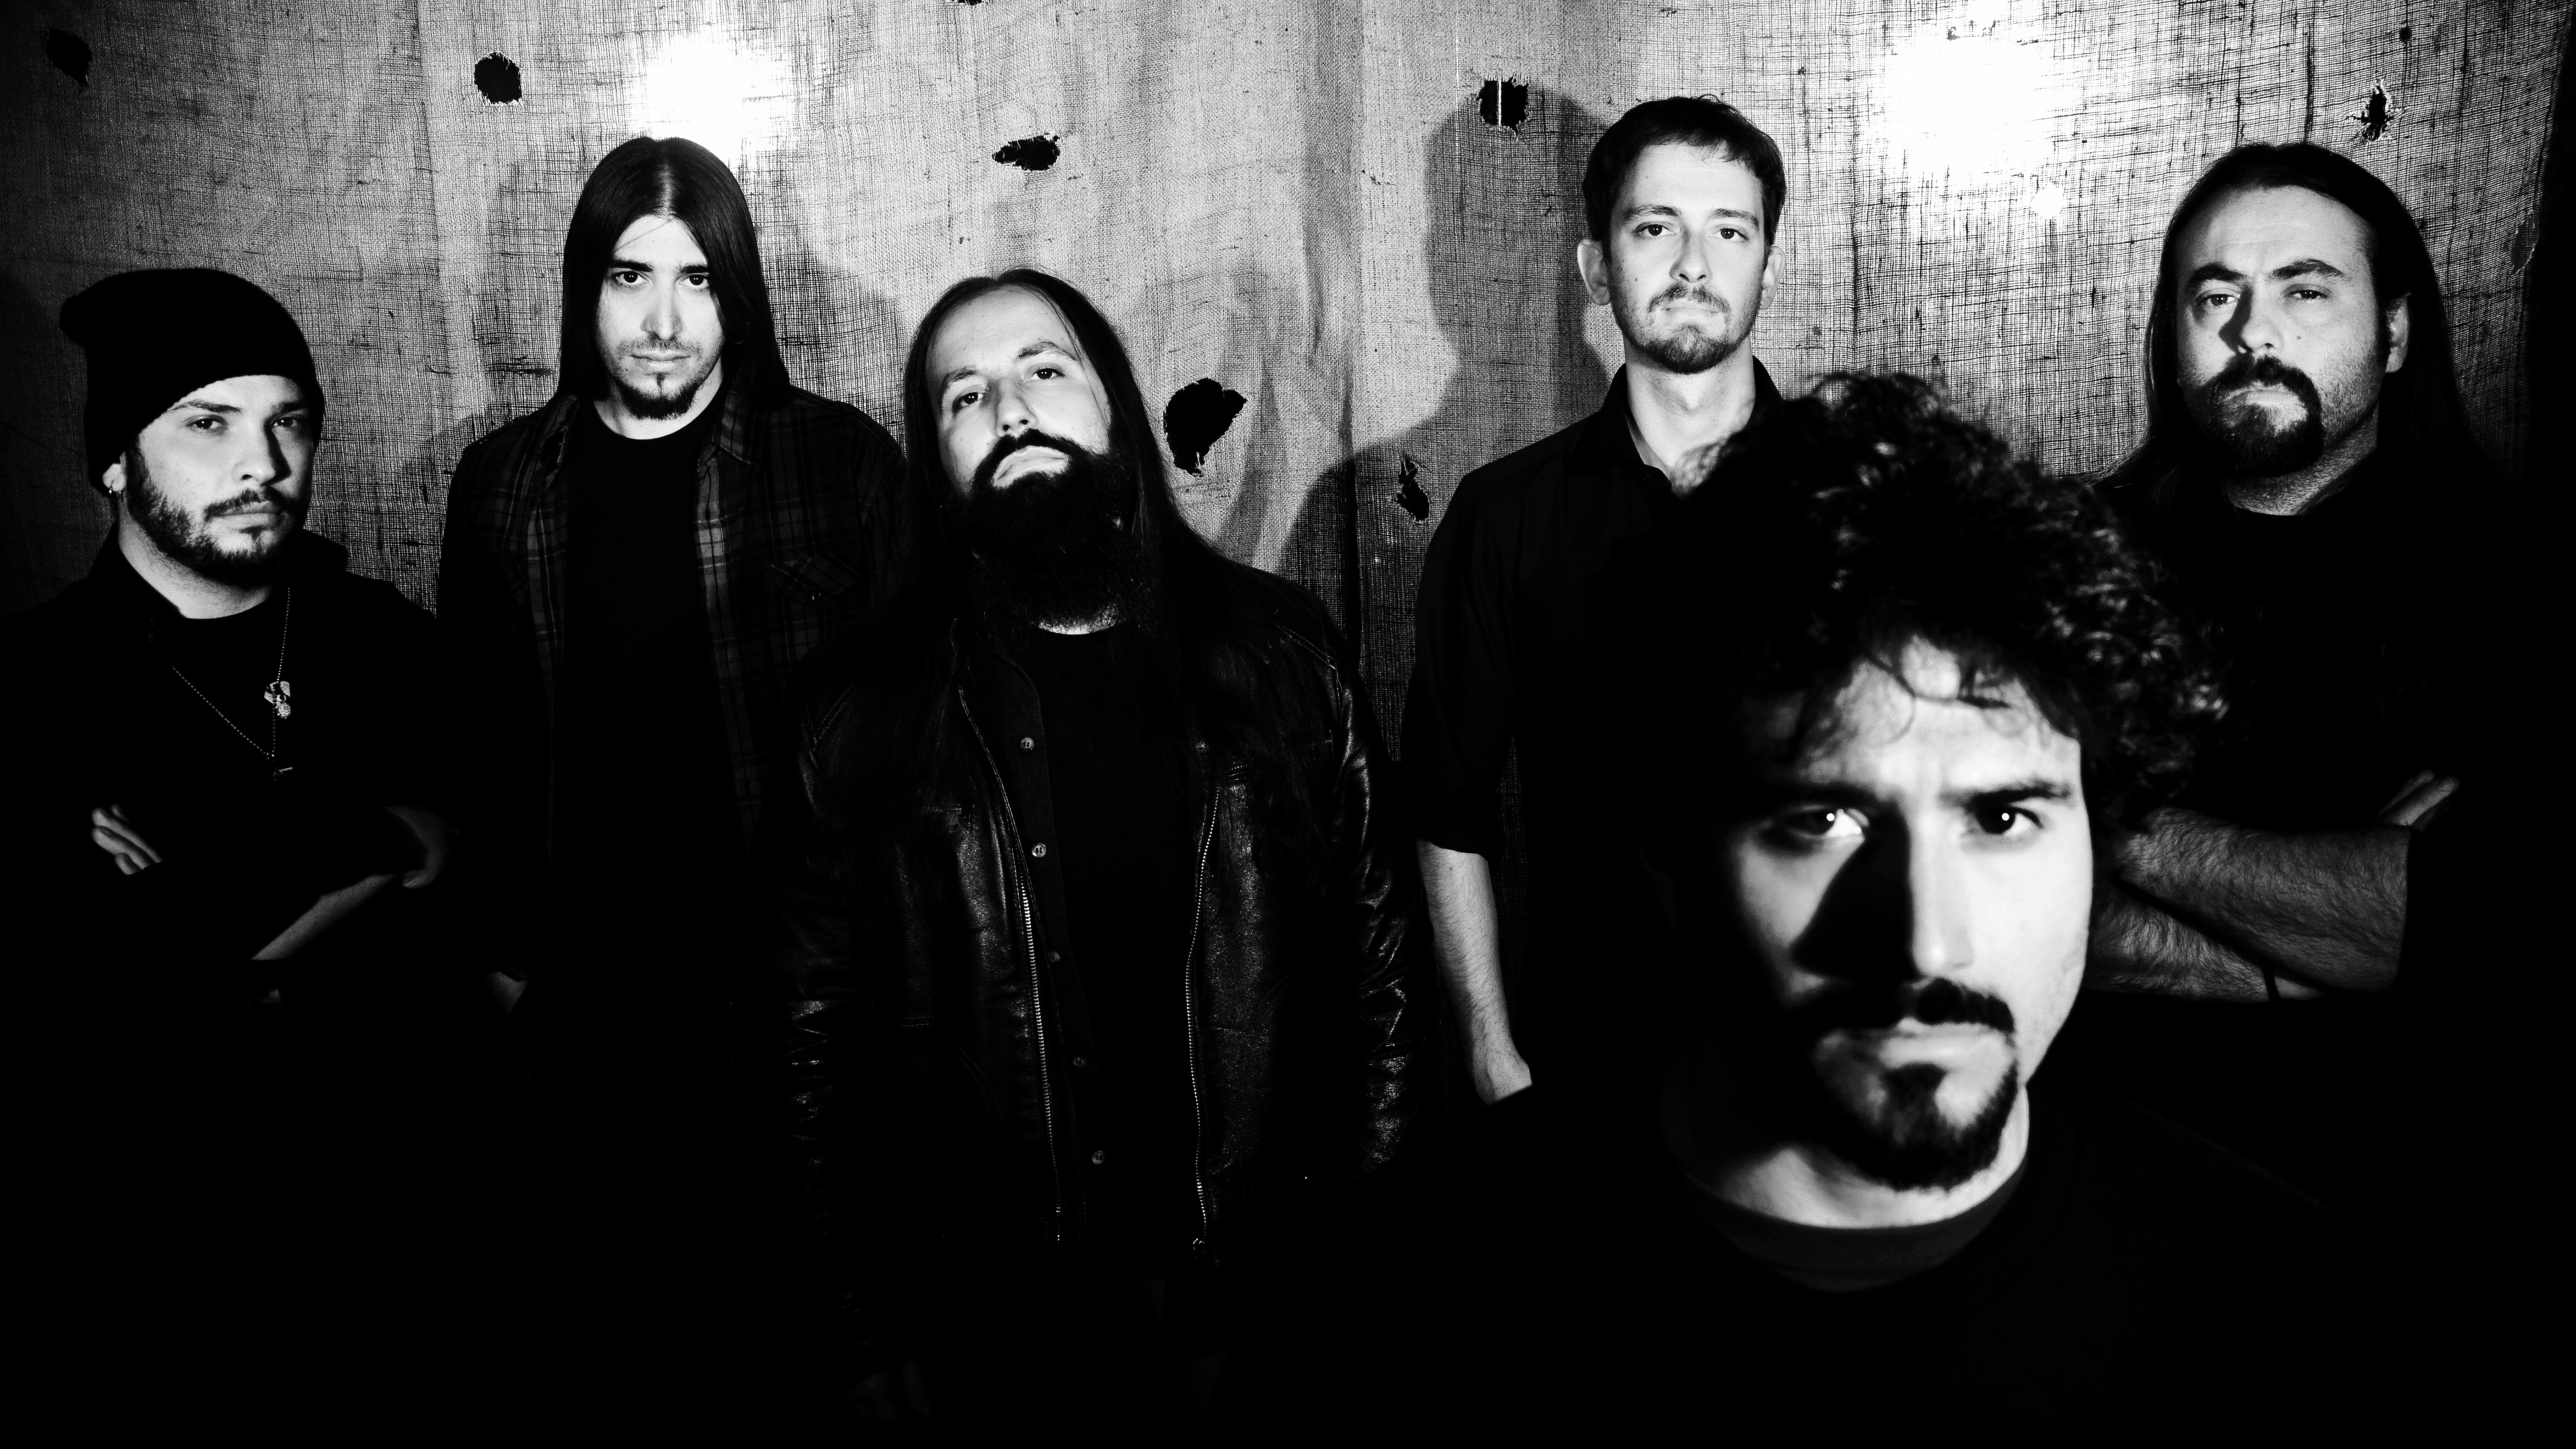 vitriol - band - 2012